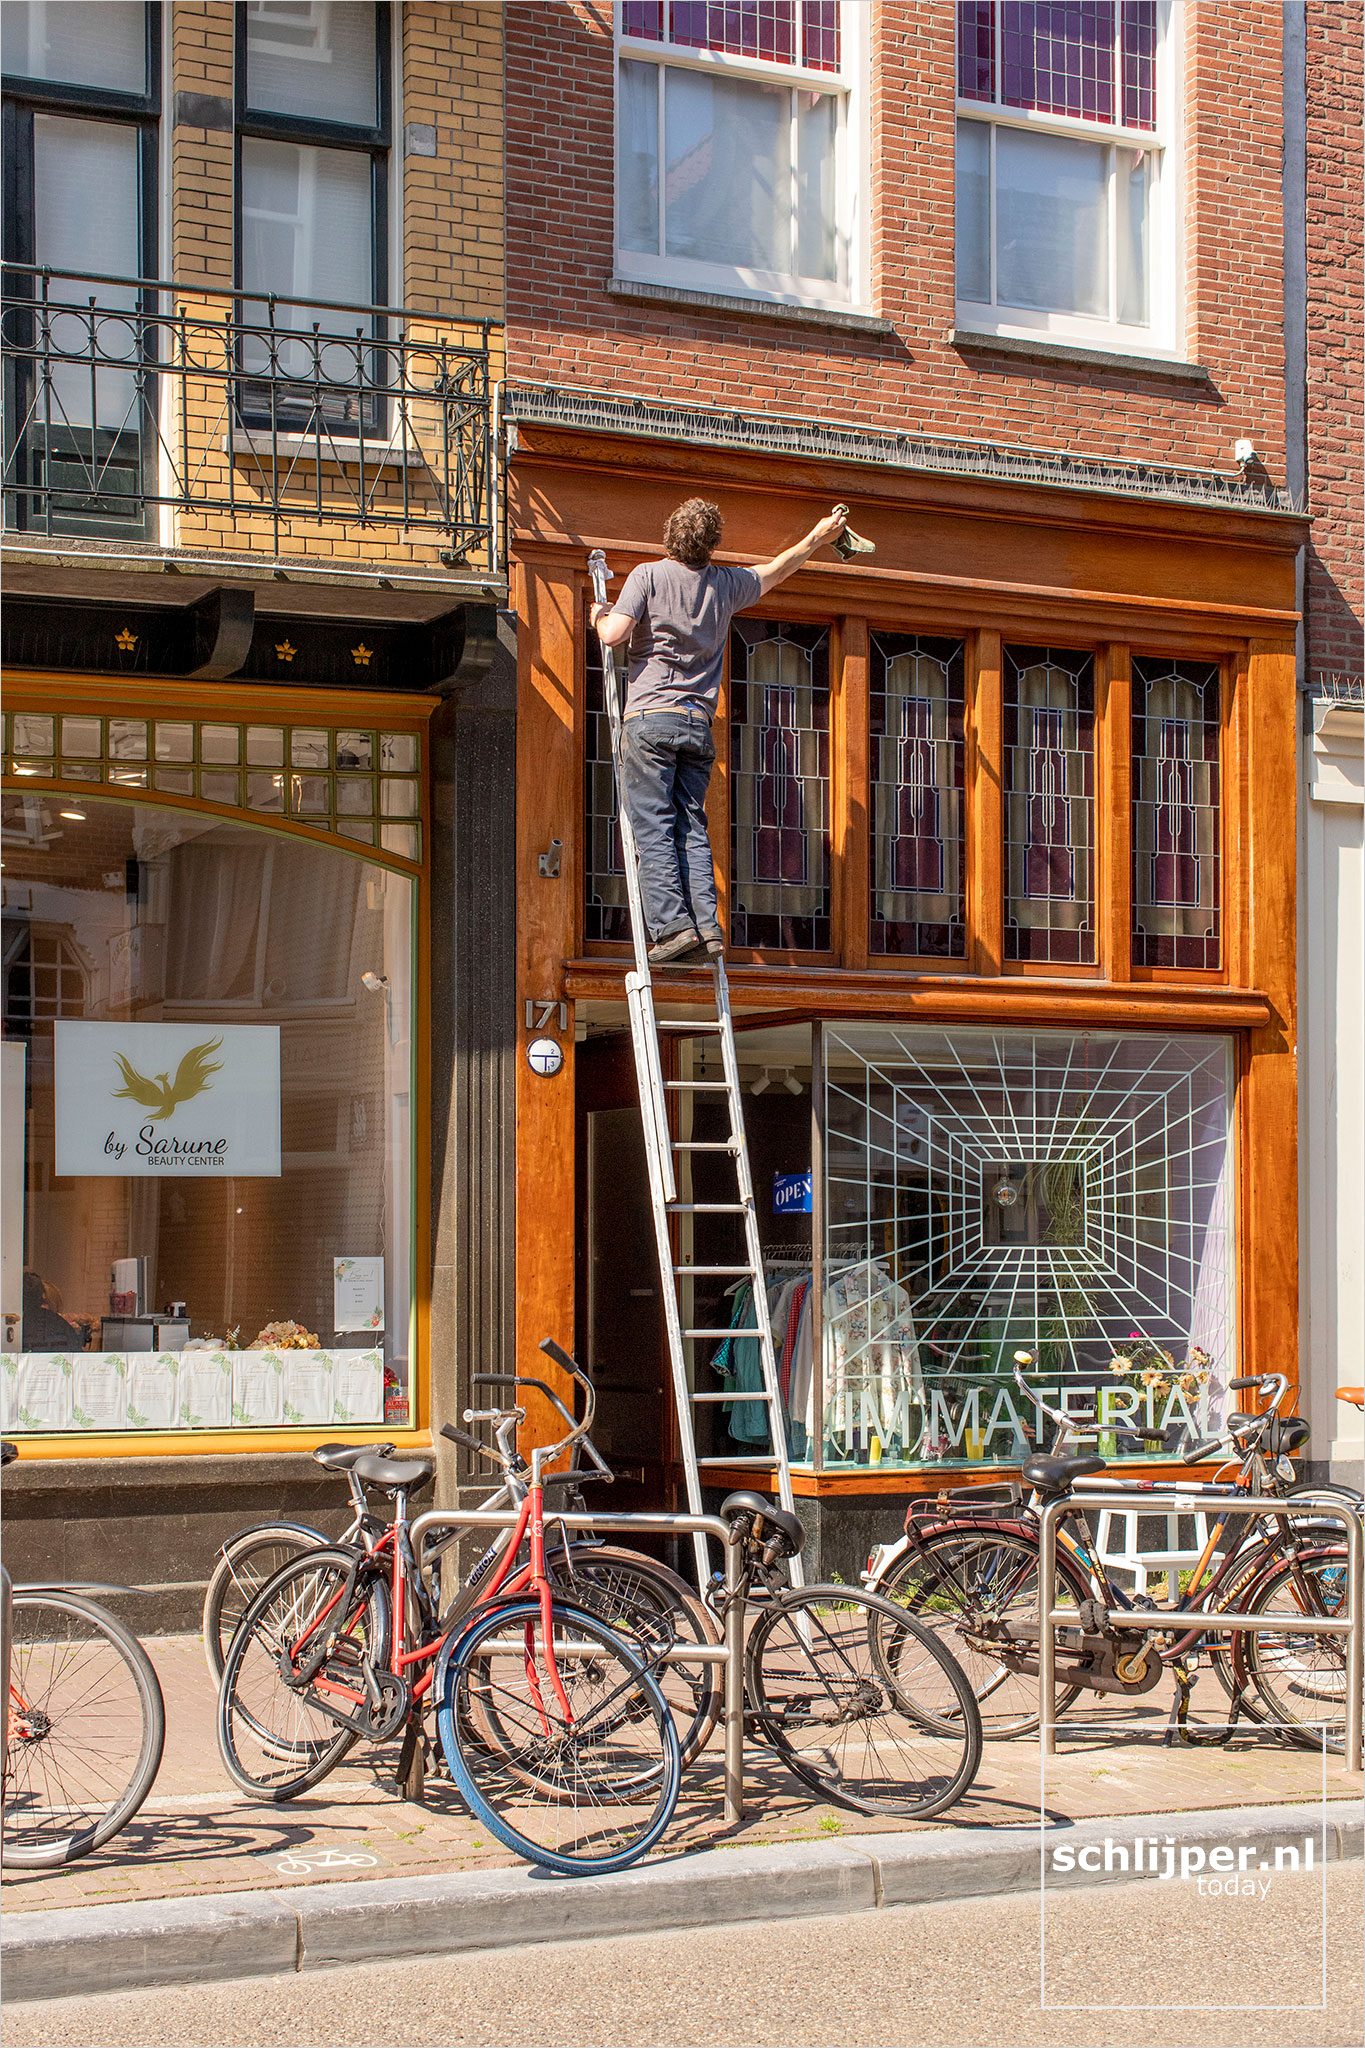 The Netherlands, Amsterdam 9 juni 2021